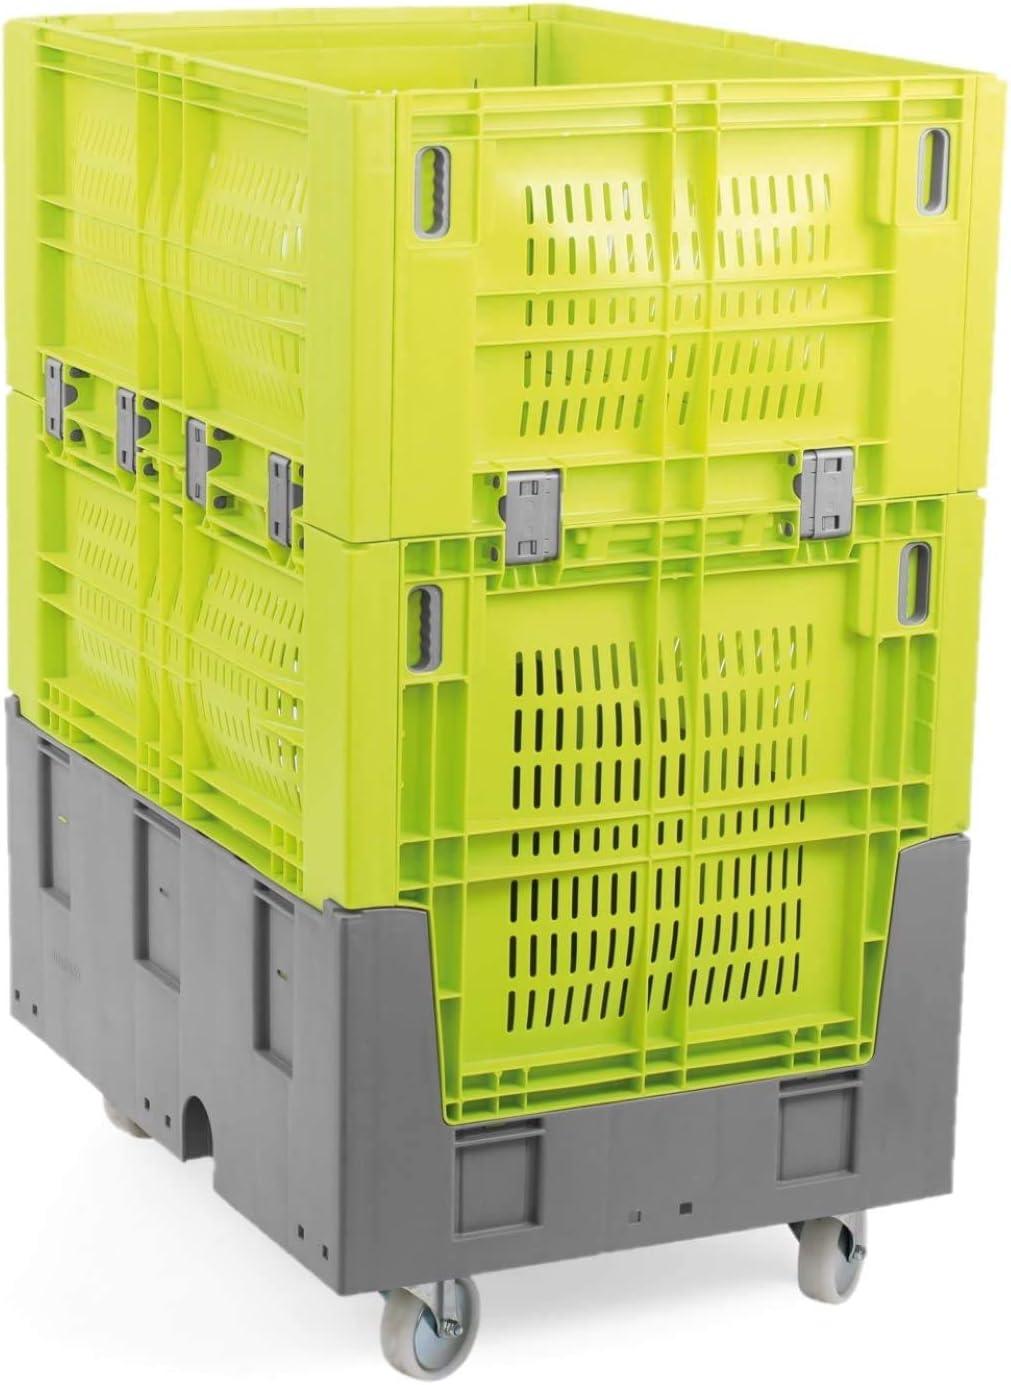 Caja para almacén con ruedas: Amazon.es: Hogar